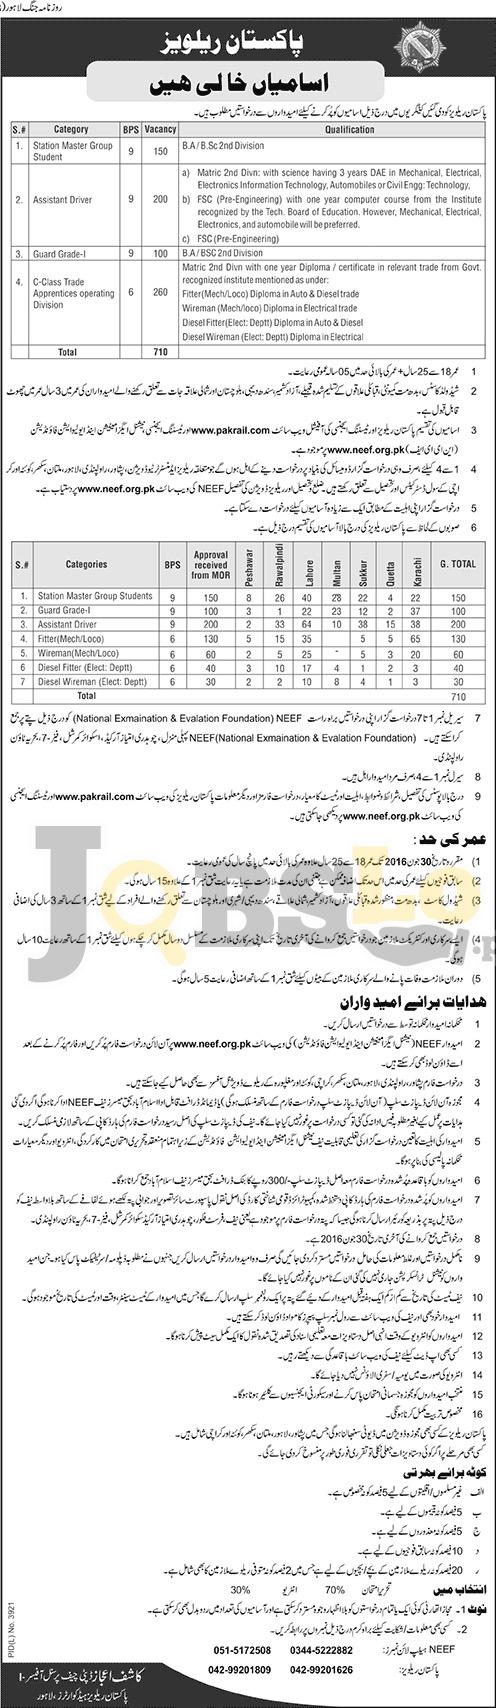 Pakistan Railways Jobs June 2016 Online Application Form www.neef.org.pk